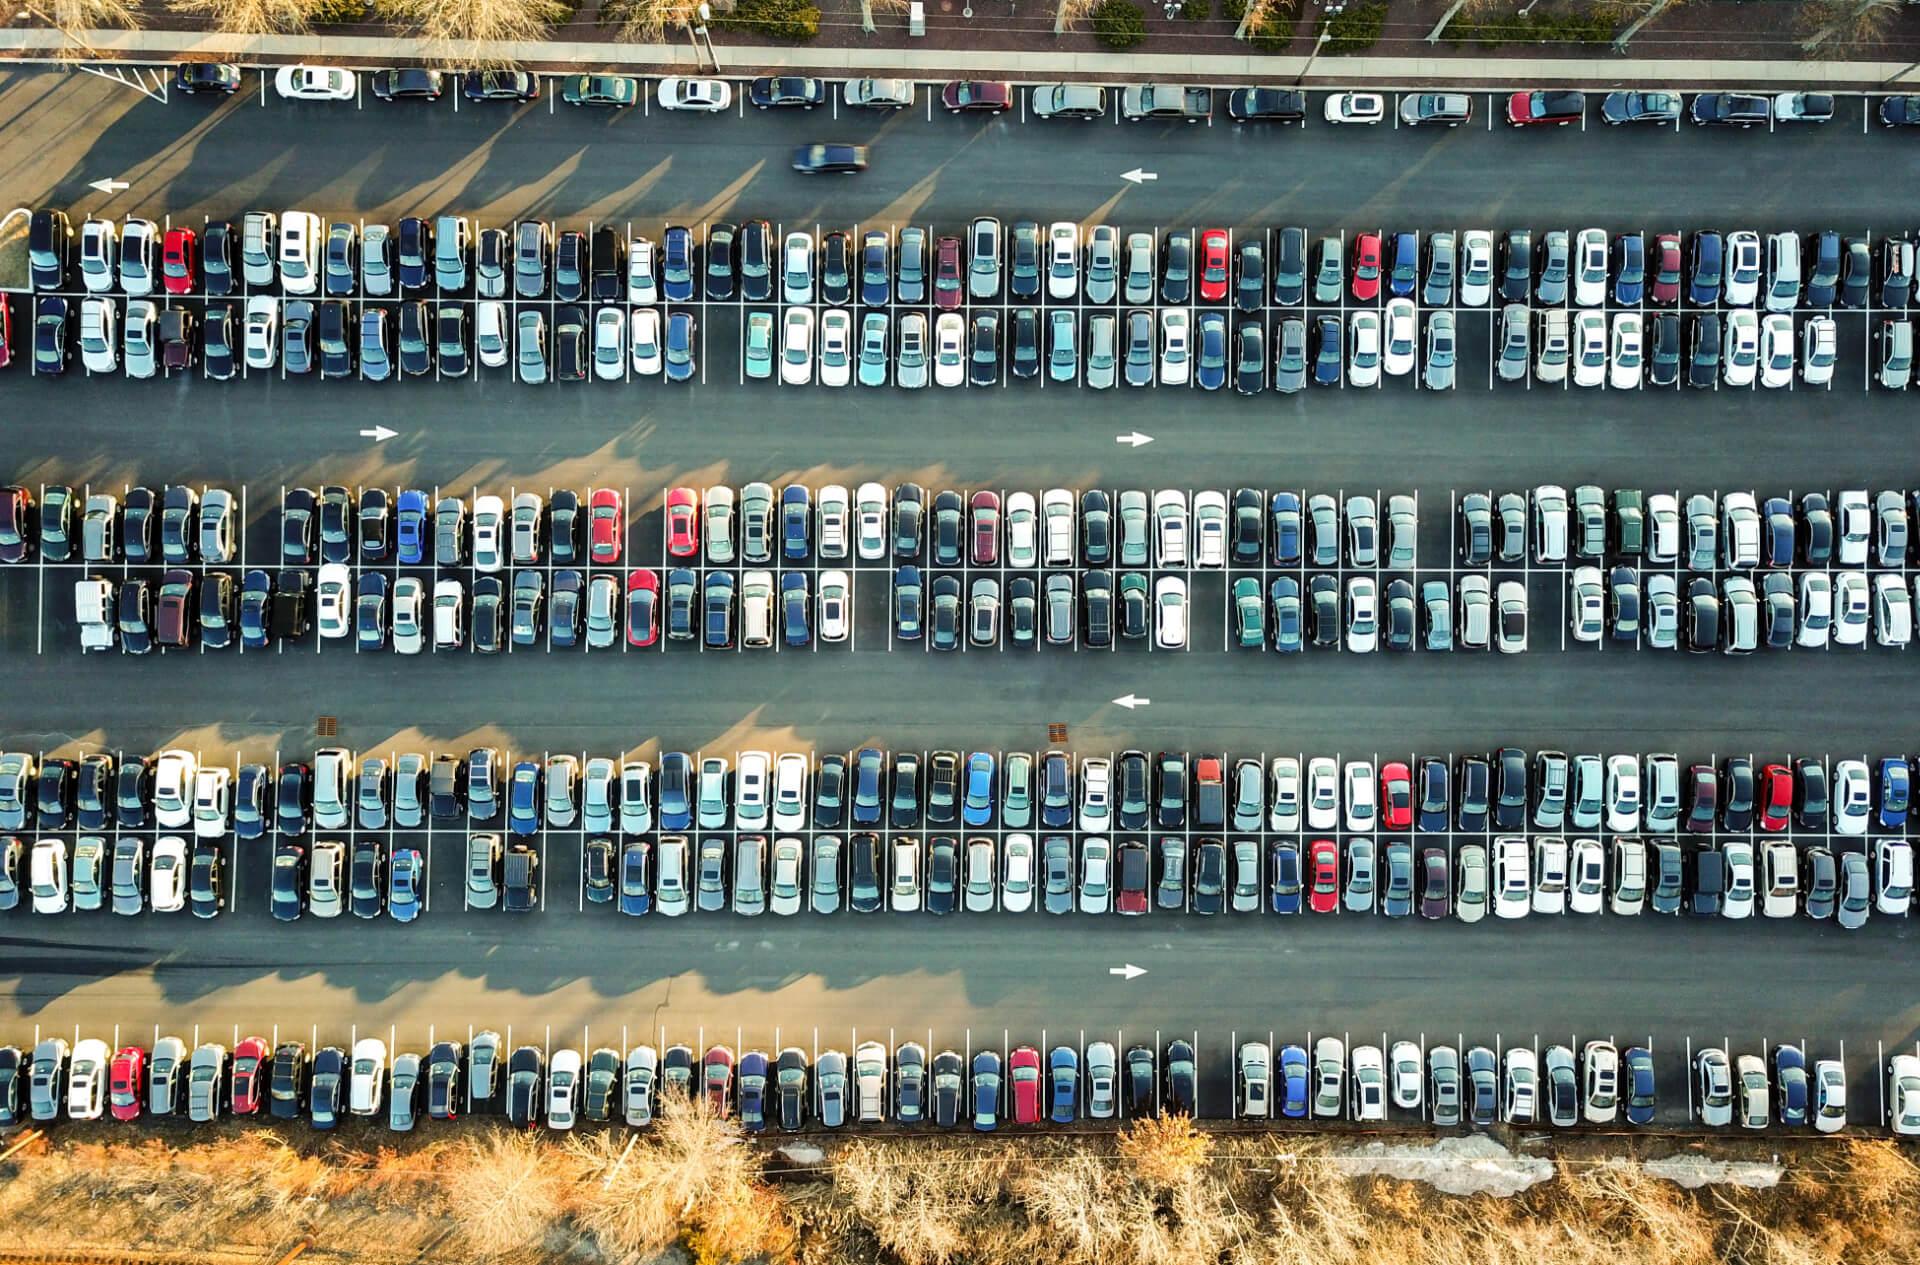 POMCAR - Bypass dishonest car dealers